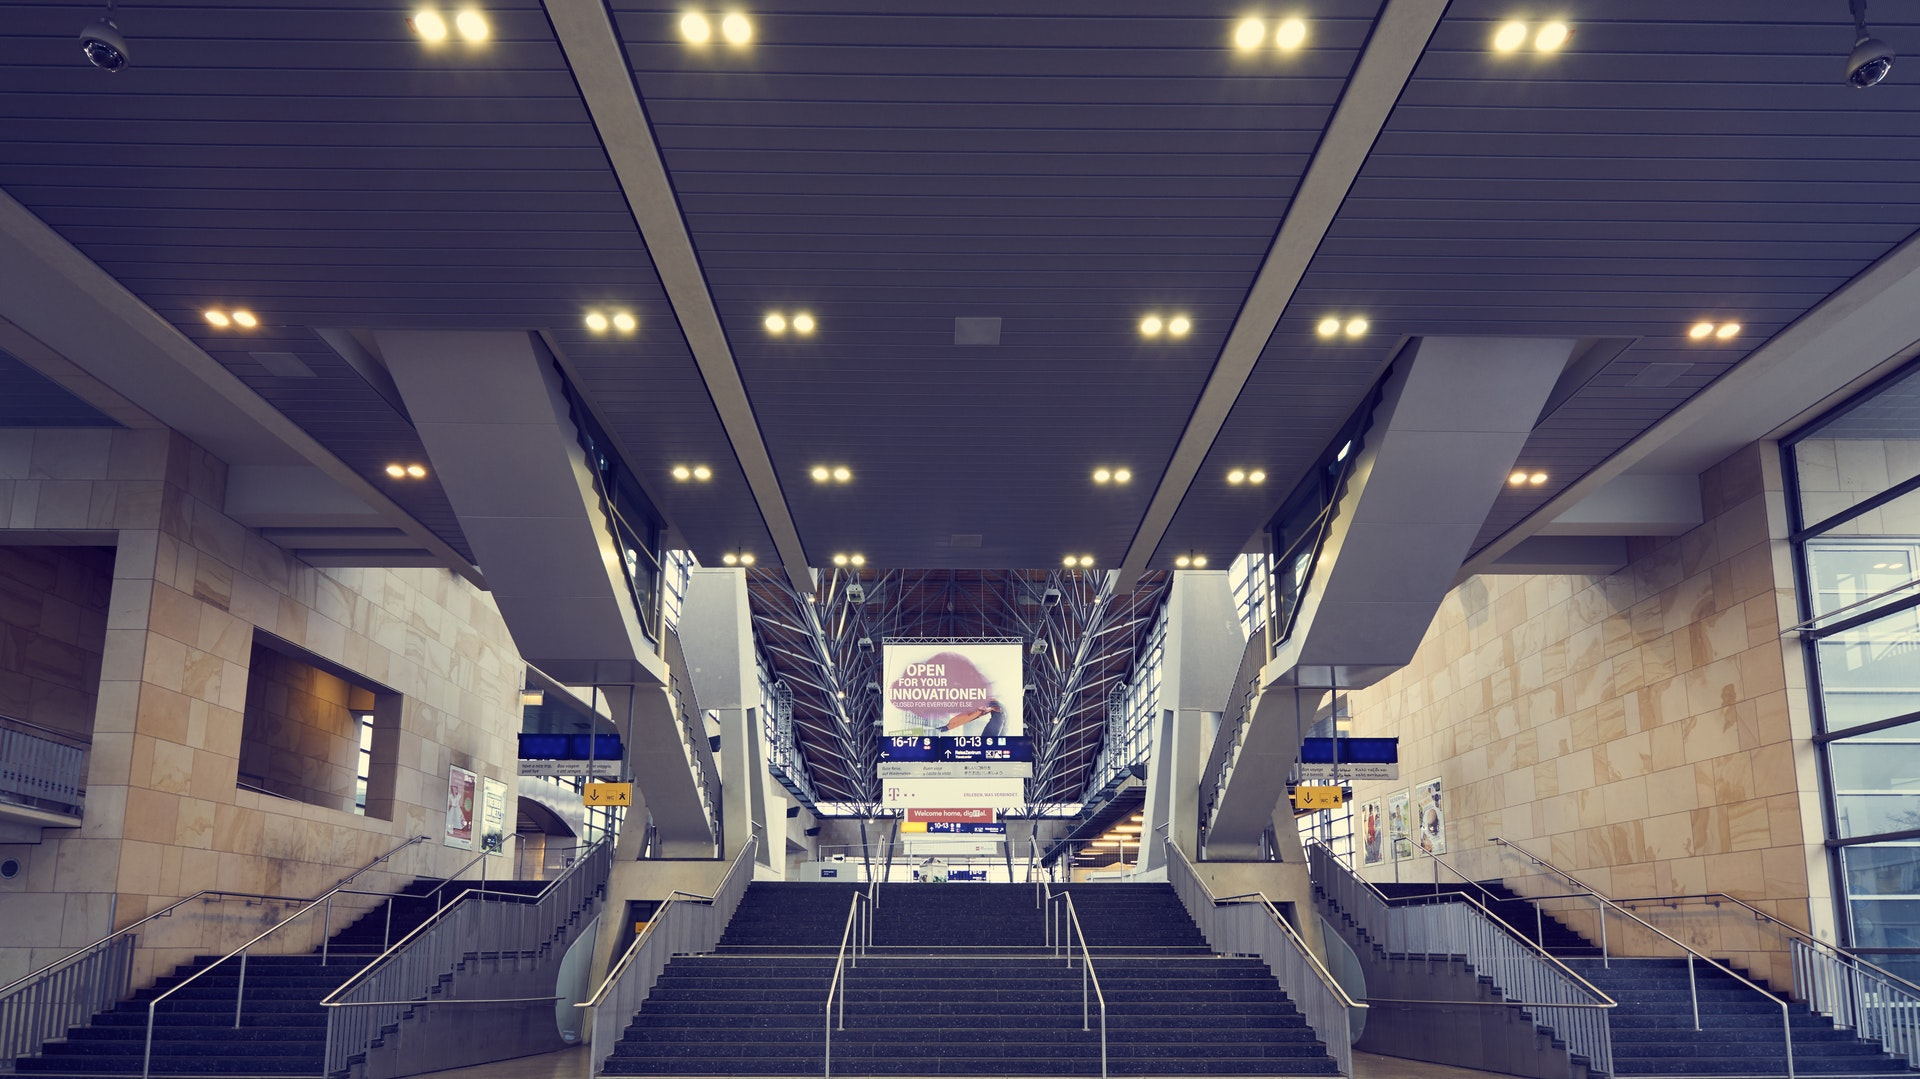 Airport digital signage : Digital billboard